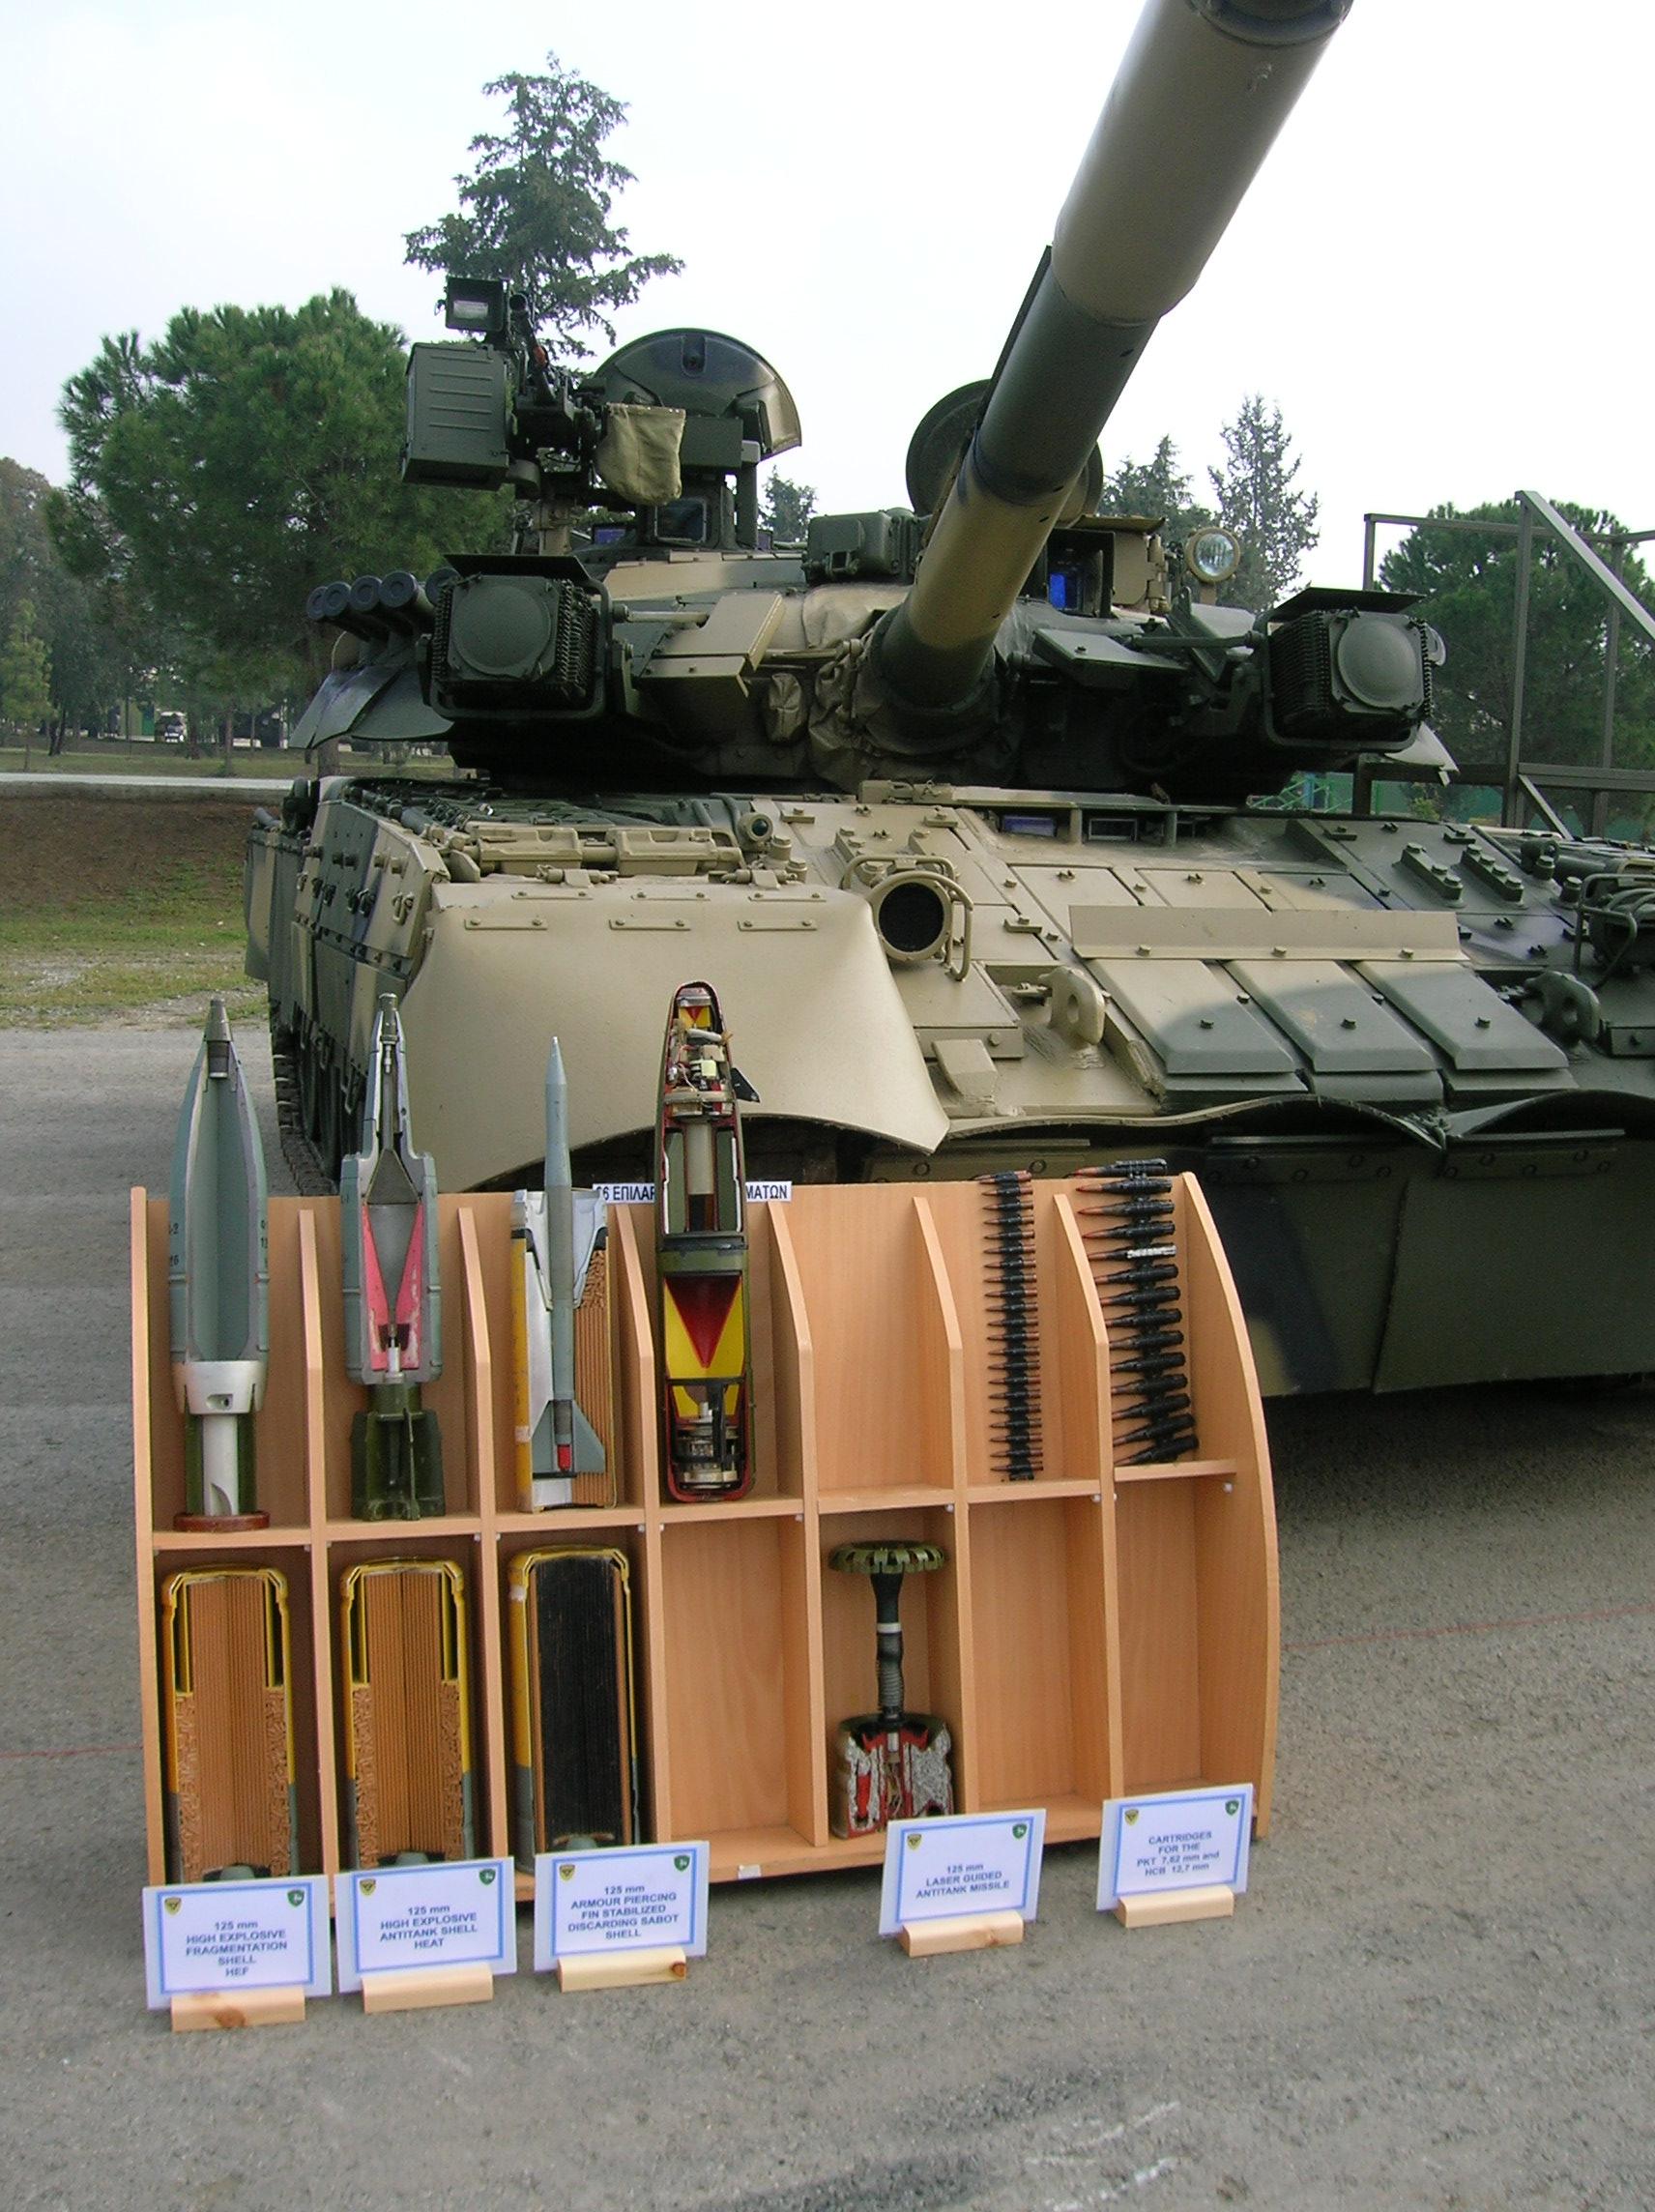 http://artofwar.ru/img/w/wechkanow_i_w/vivboewyetanki-semejstwot-72t-80t-90wtoroeizdanie19122011/t-90vidboepr.jpg